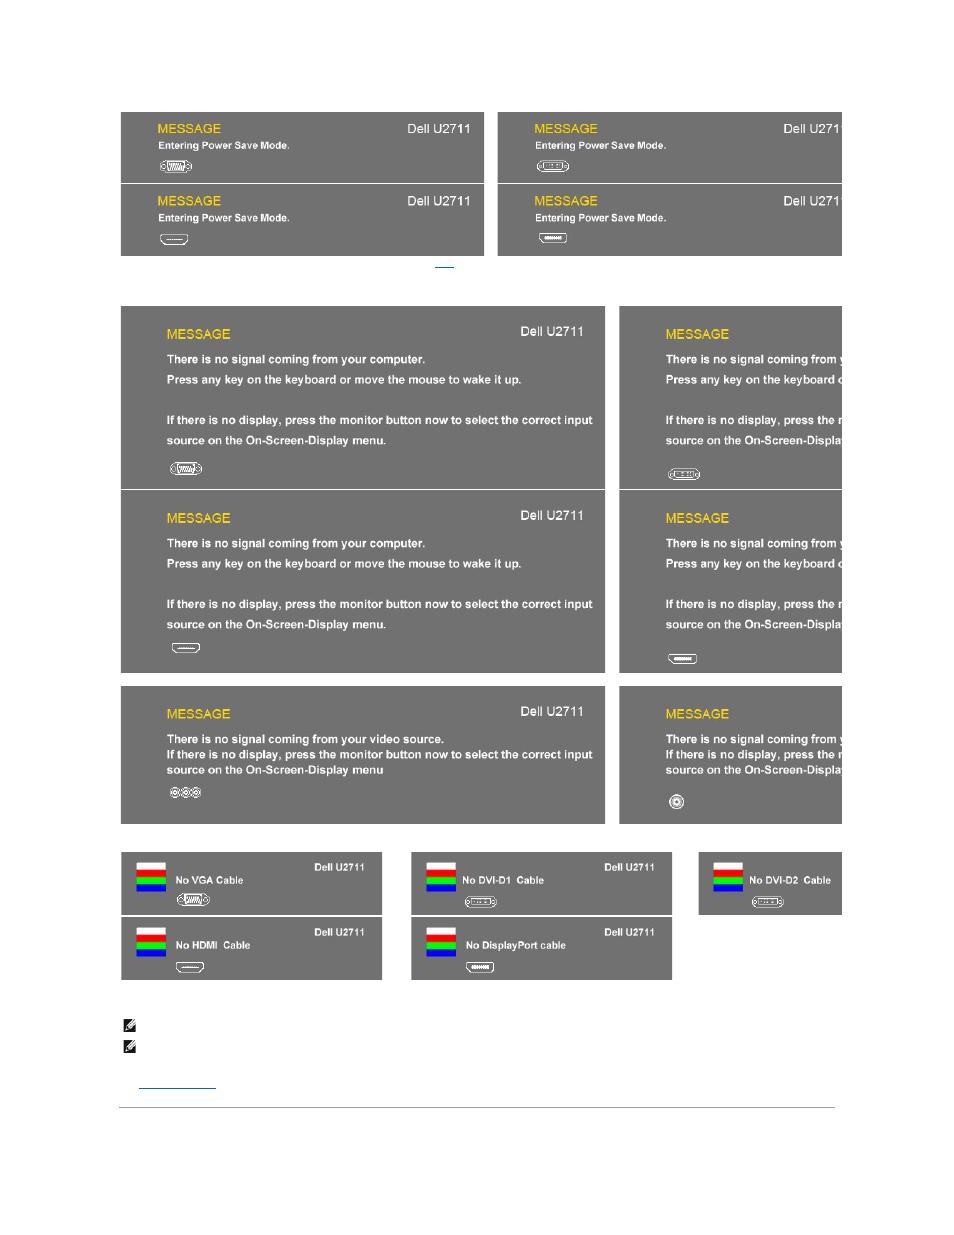 u2711 user manual manual guide example 2018 Dell UltraSharp U2711 Coupon Dell UltraSharp U2711 Coupon